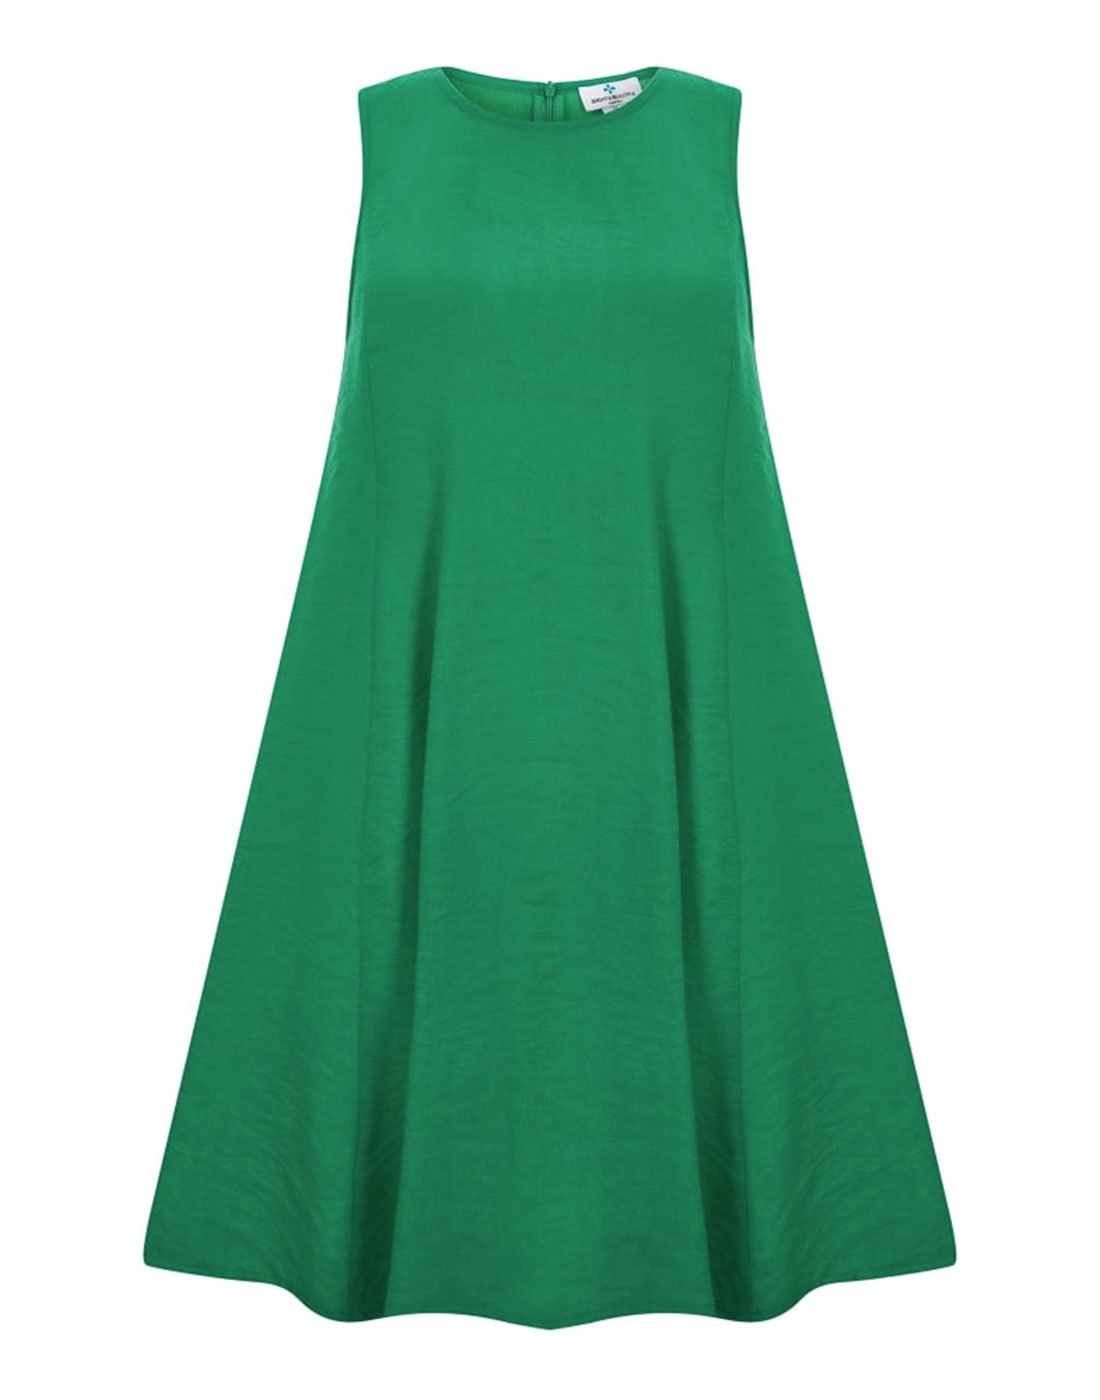 Tessa BRIGHT & BEAUTIFUL 60s Baby Doll Dress Green